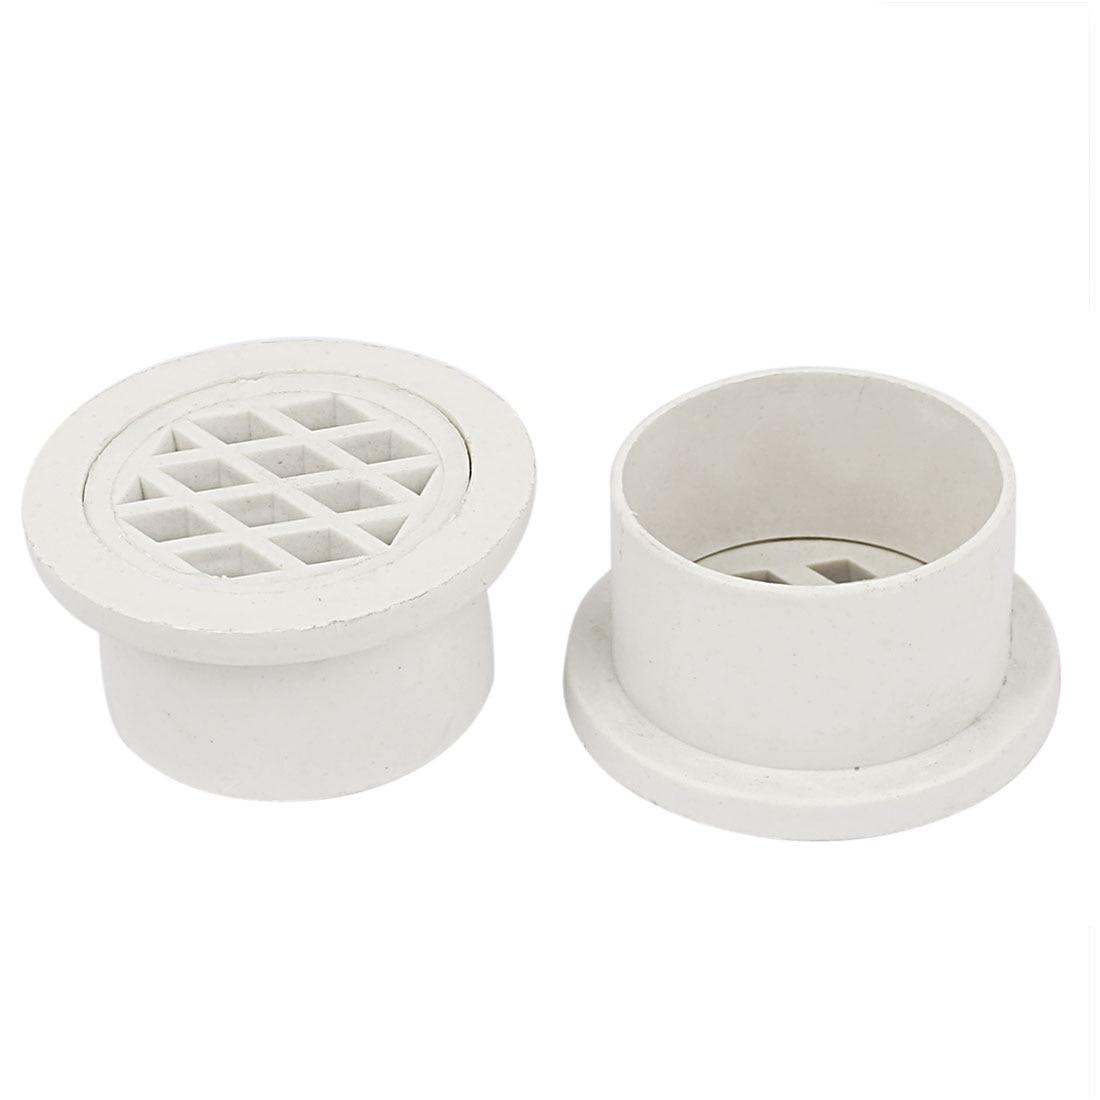 UXCELL Basement Toilet White Pvc Round Strainer Floor Drain Cover 2Pcs  White(China (Mainland